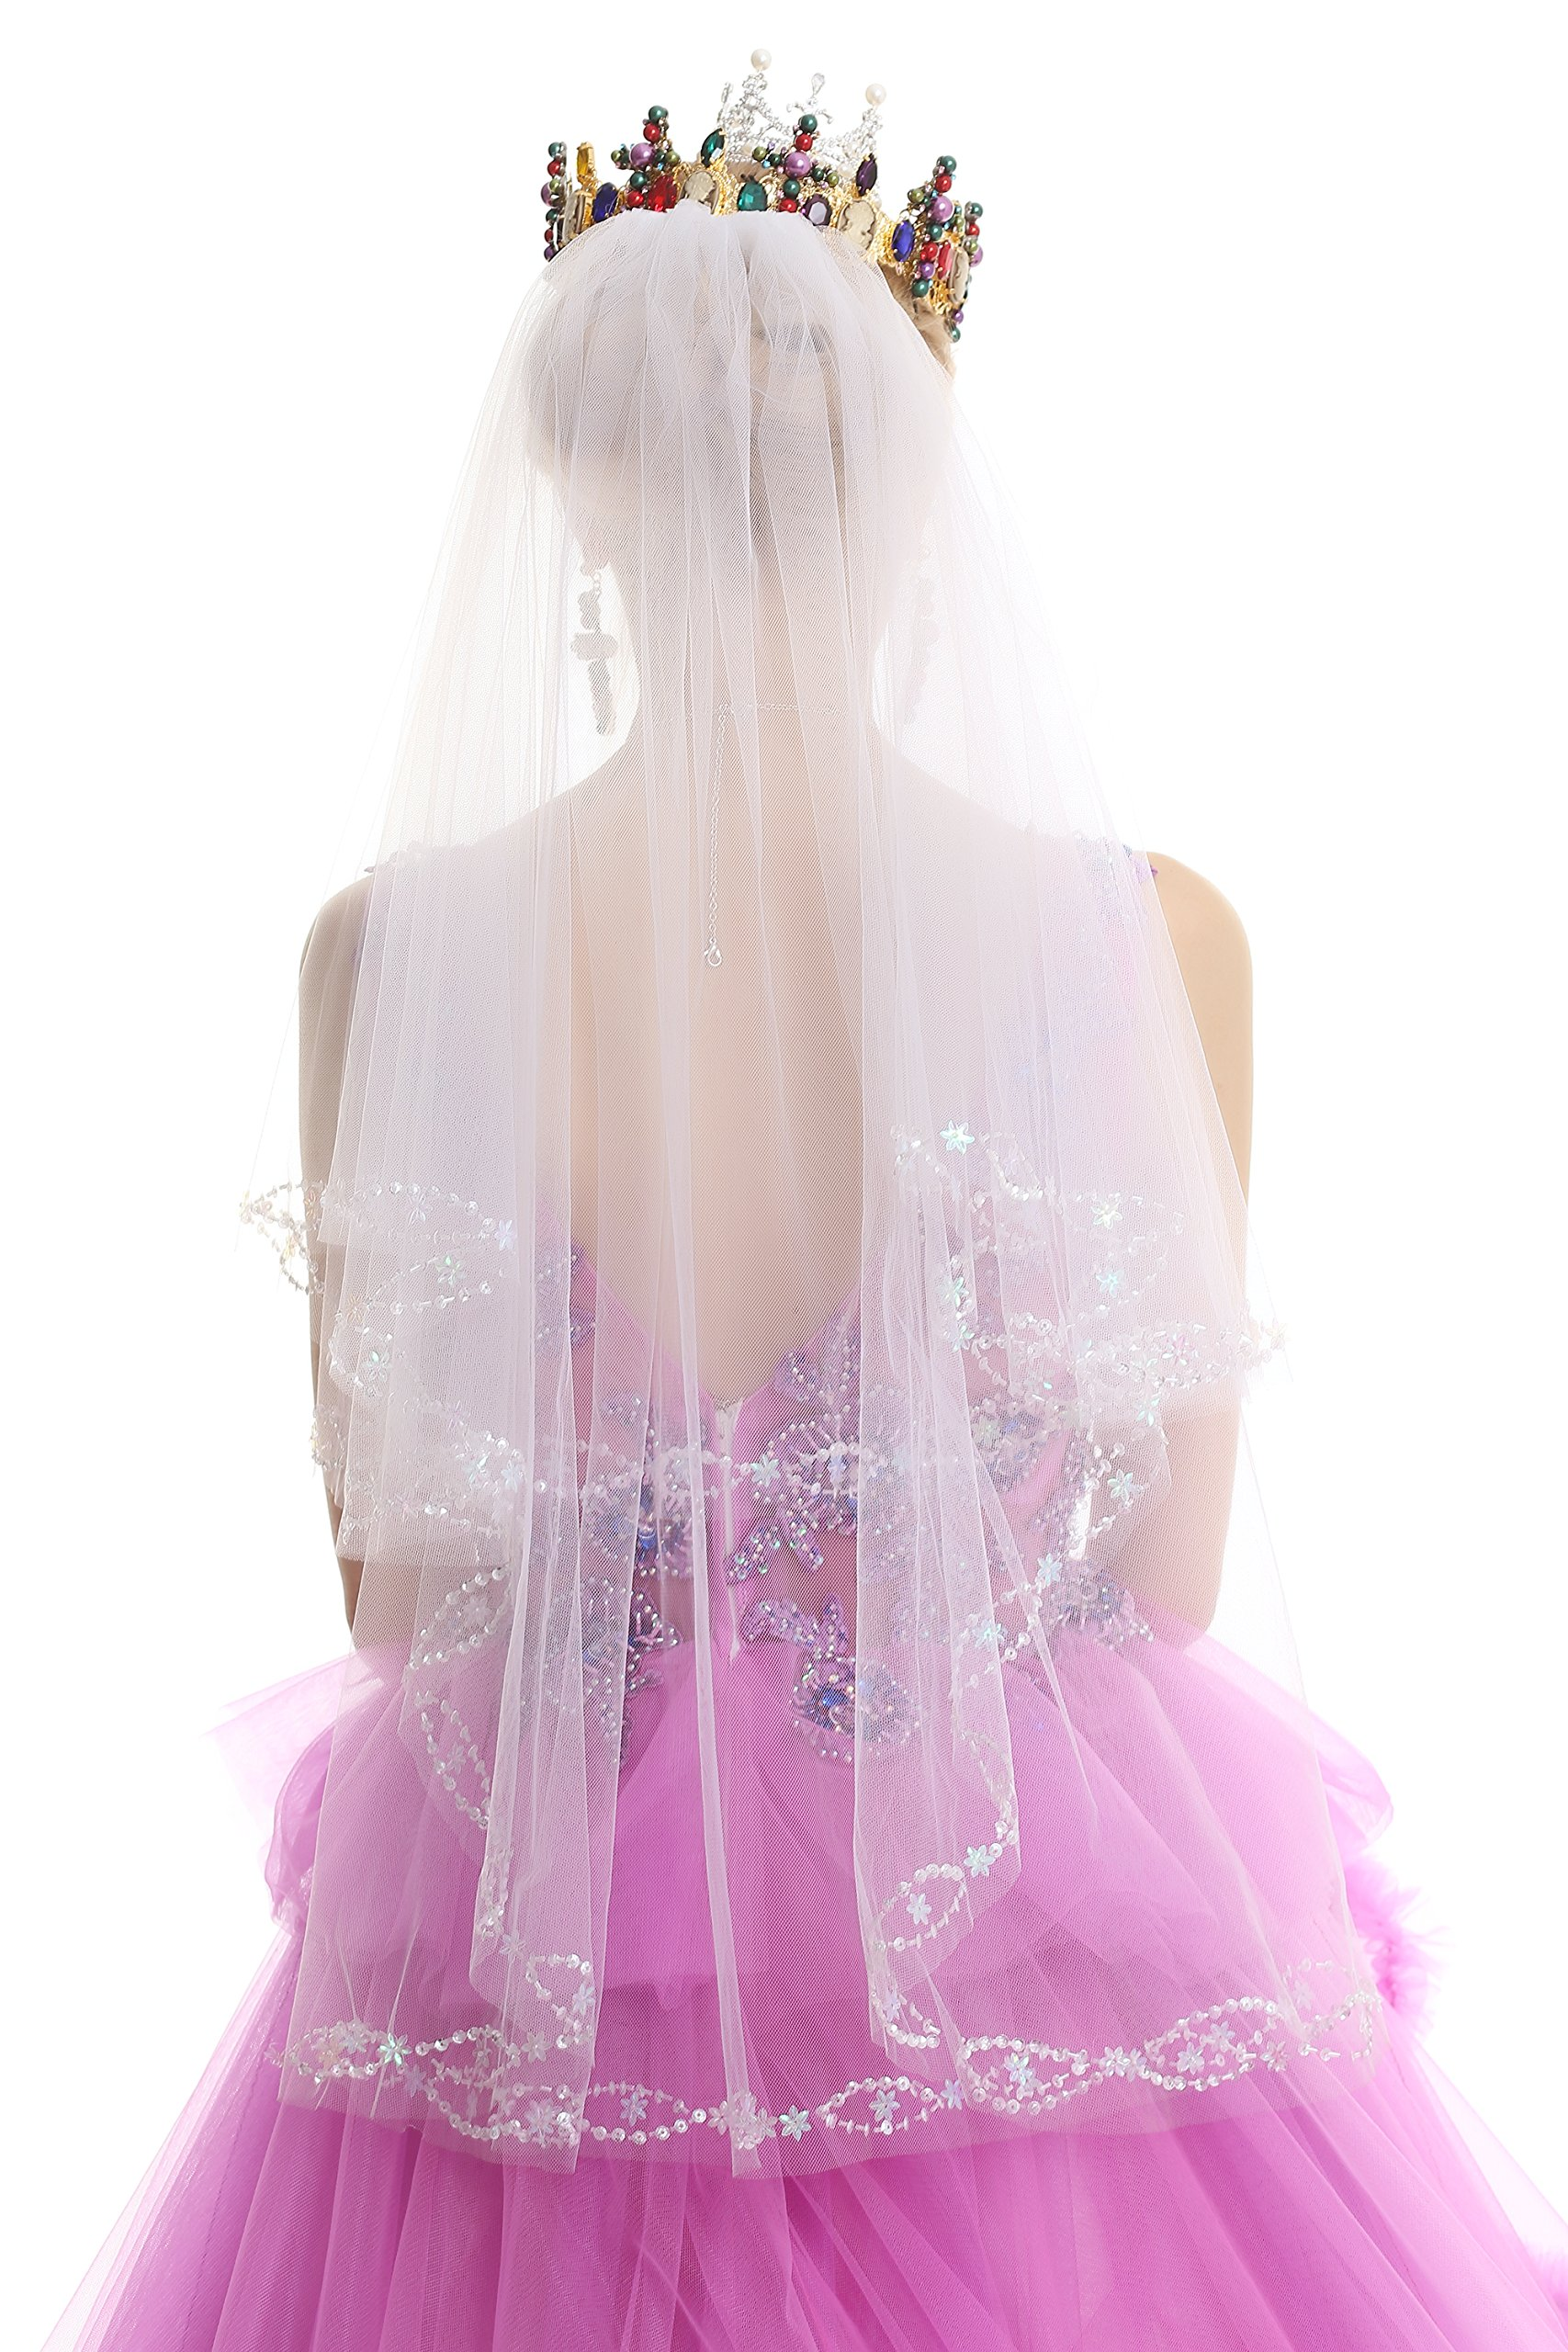 Pop-Fashion Women's 2T 2 Tie Veil Cathedral Wedding Rhinestone Veil 148 (White)